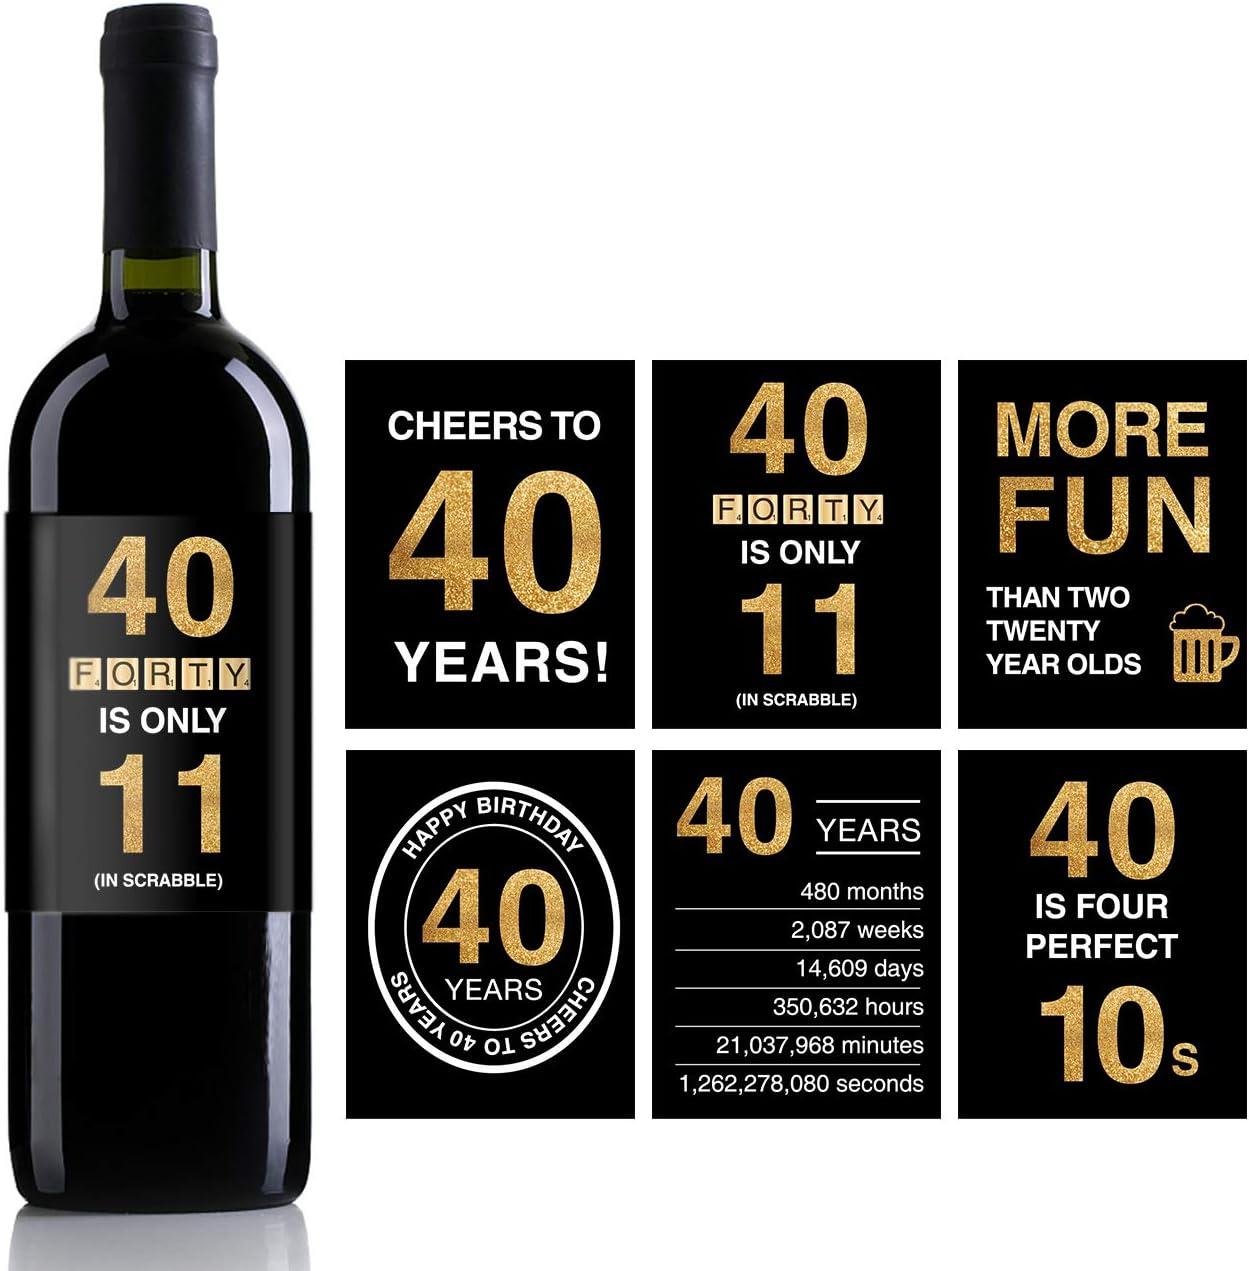 Amazon.com: Etiquetas adhesivas para botella de vino de 40 ...